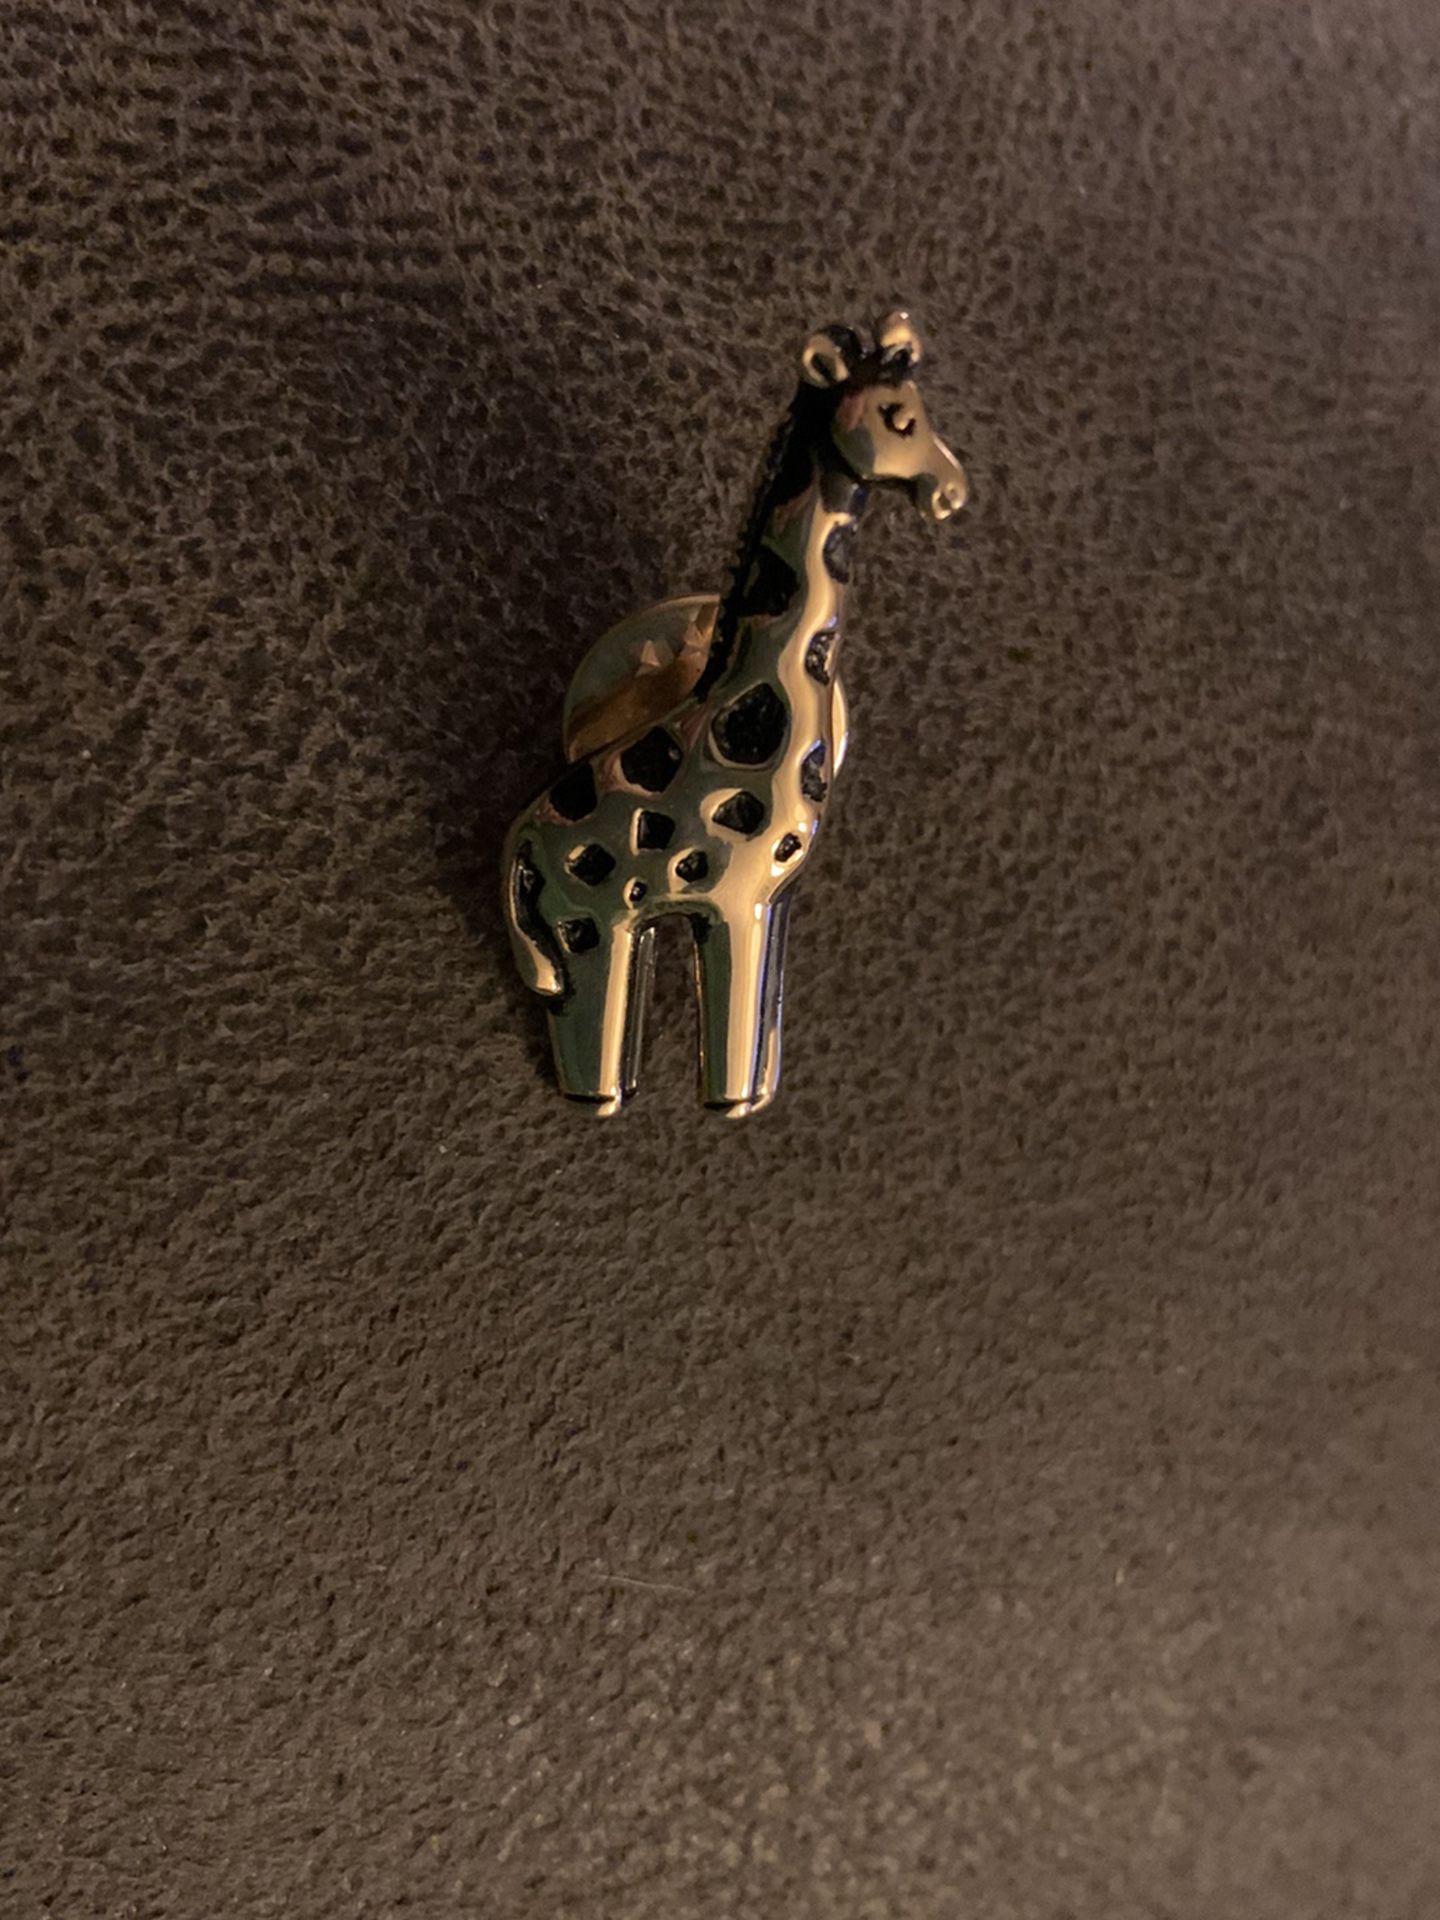 Giraffe Pin Or Tie Clasp (new) Very Nice